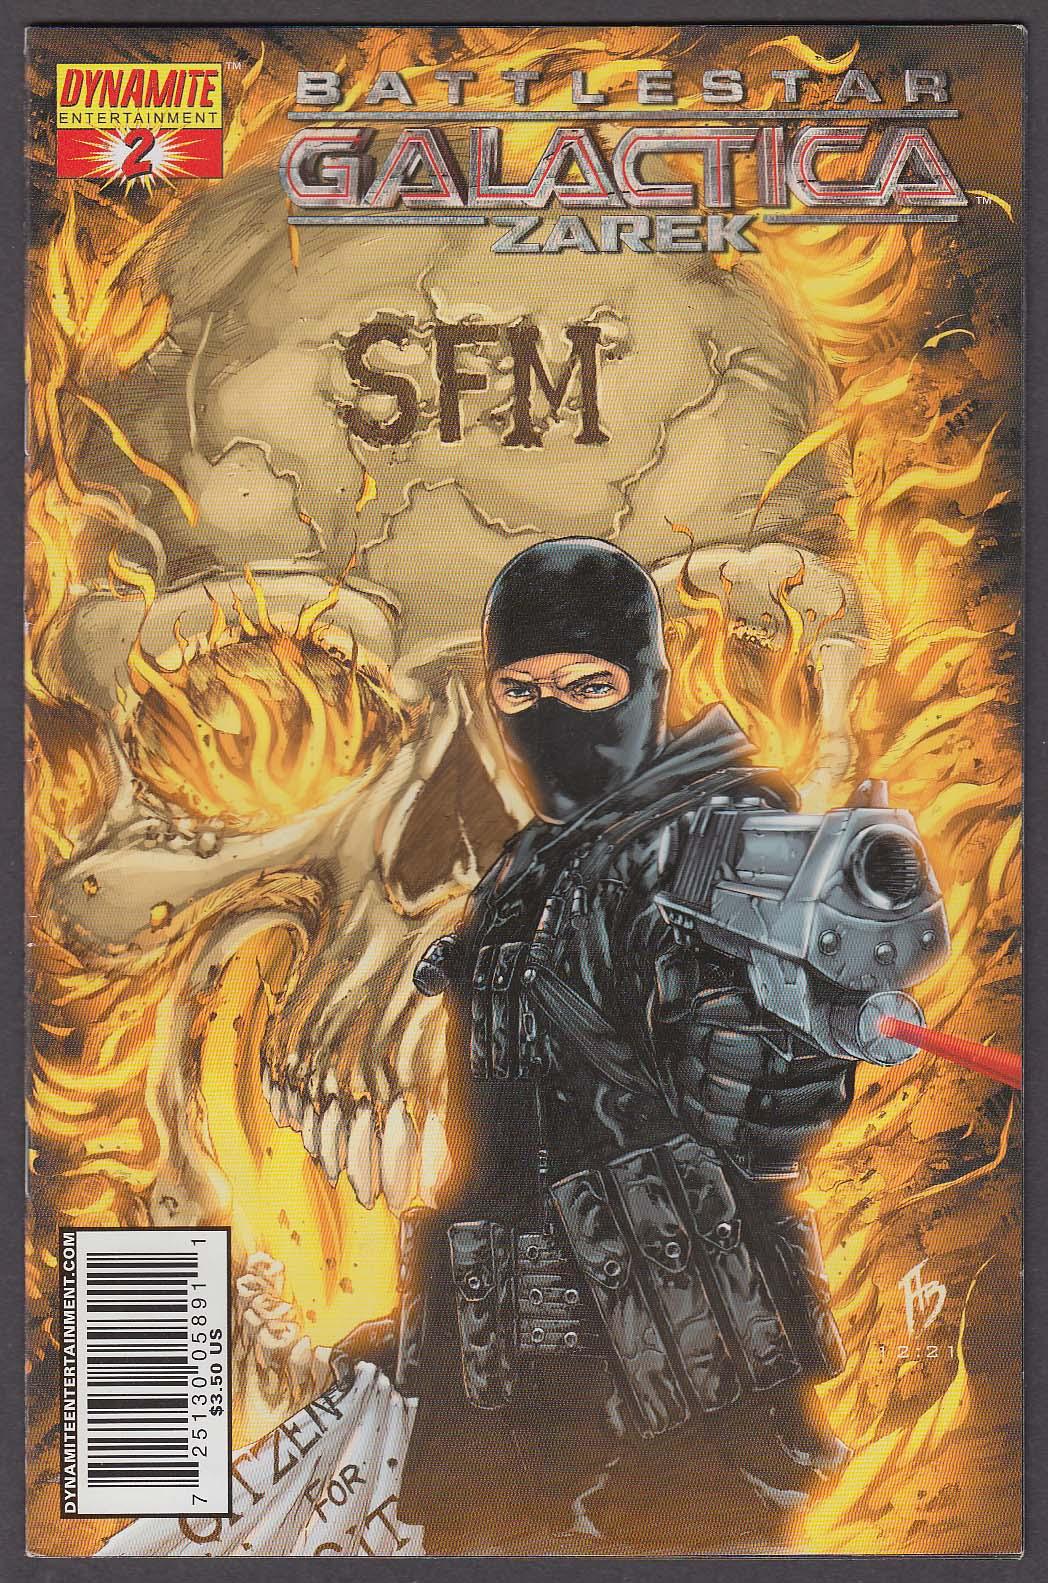 BATTLESTAR GALACTICA ZAREK #2 Dynamite comic book 2007 1st Printing